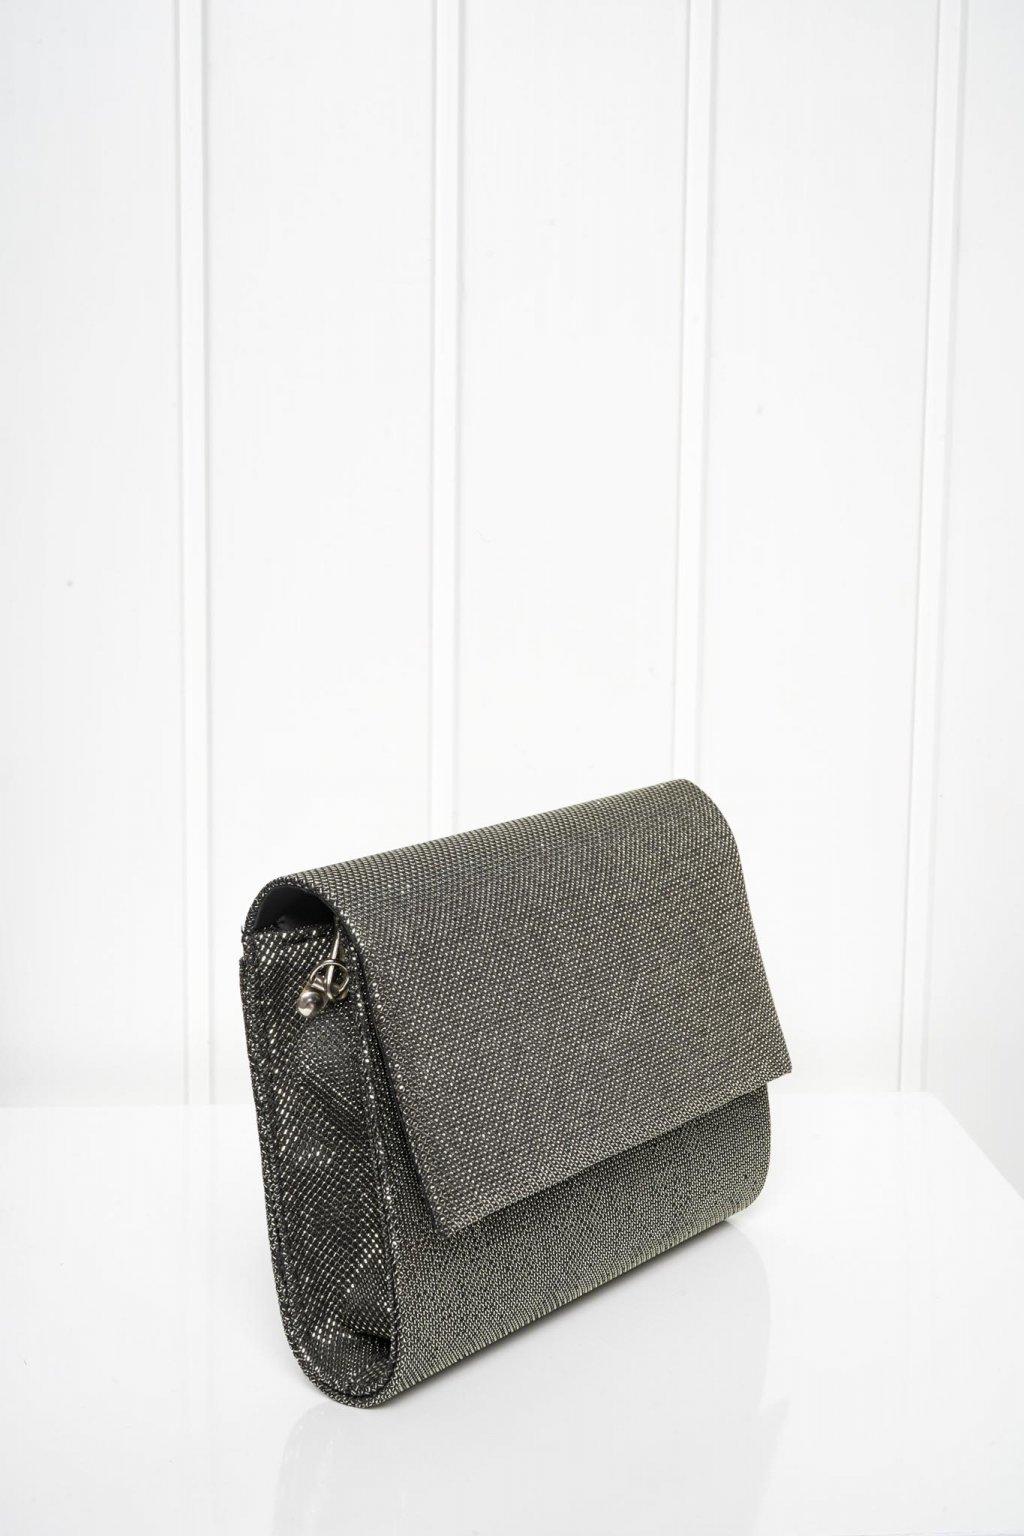 Kabelka, crossbody, ruksak, shopping bag, shopperka, 577 – kópia